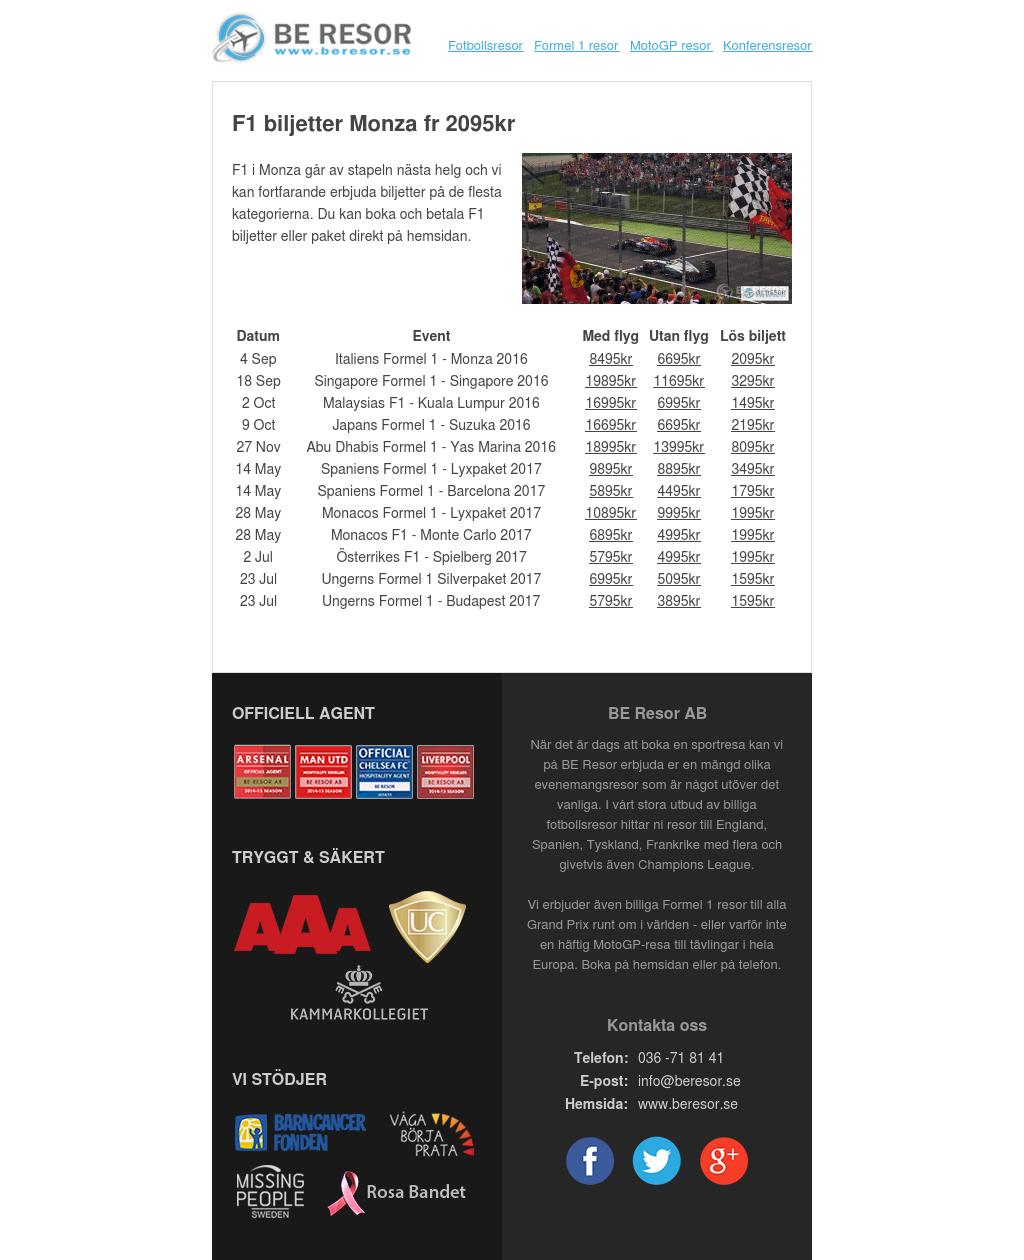 F1 biljetter Monza fr 2095kr